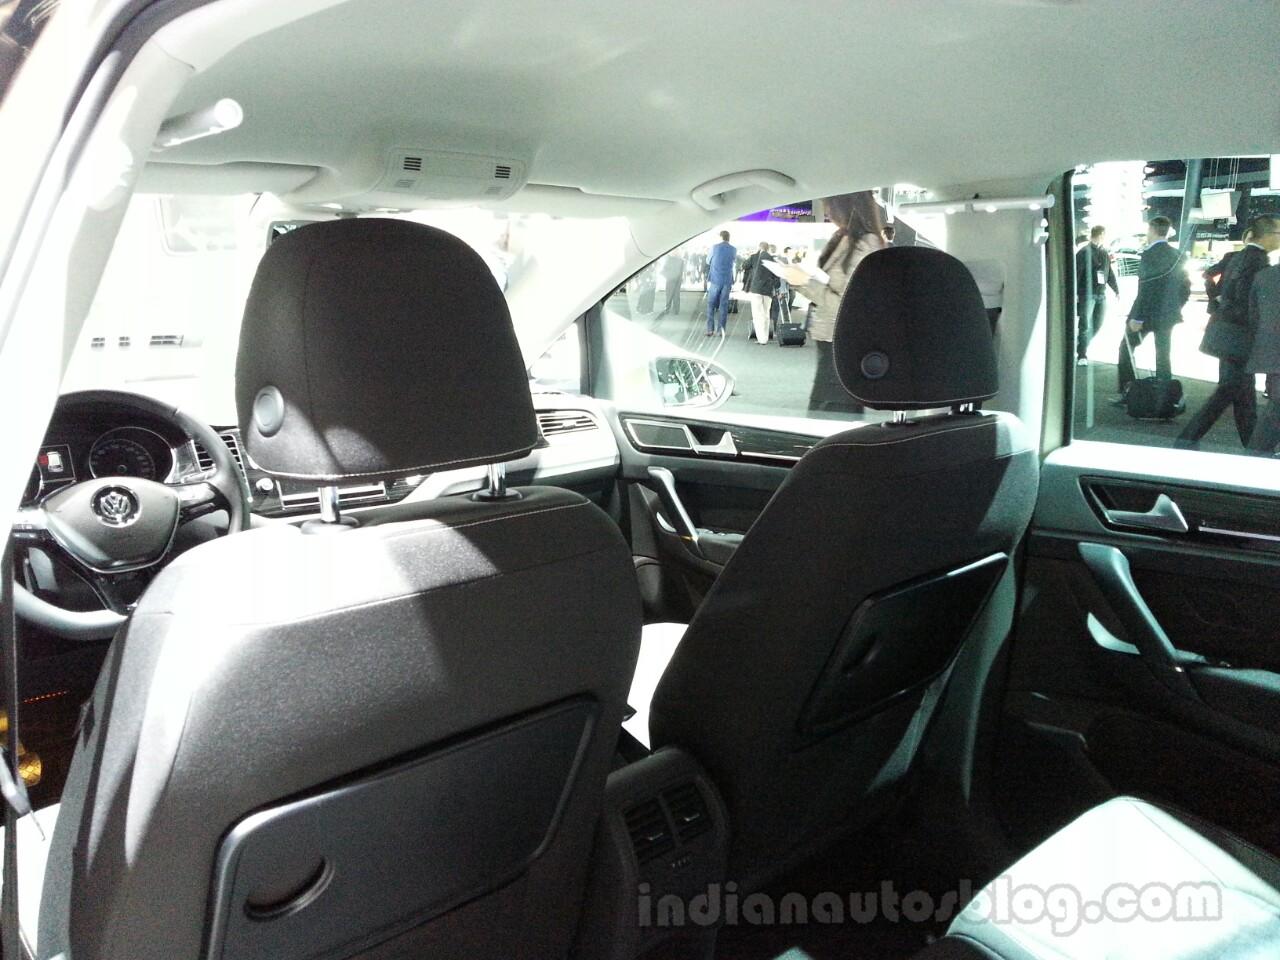 VW Golf Sportsvan Concept Headrests